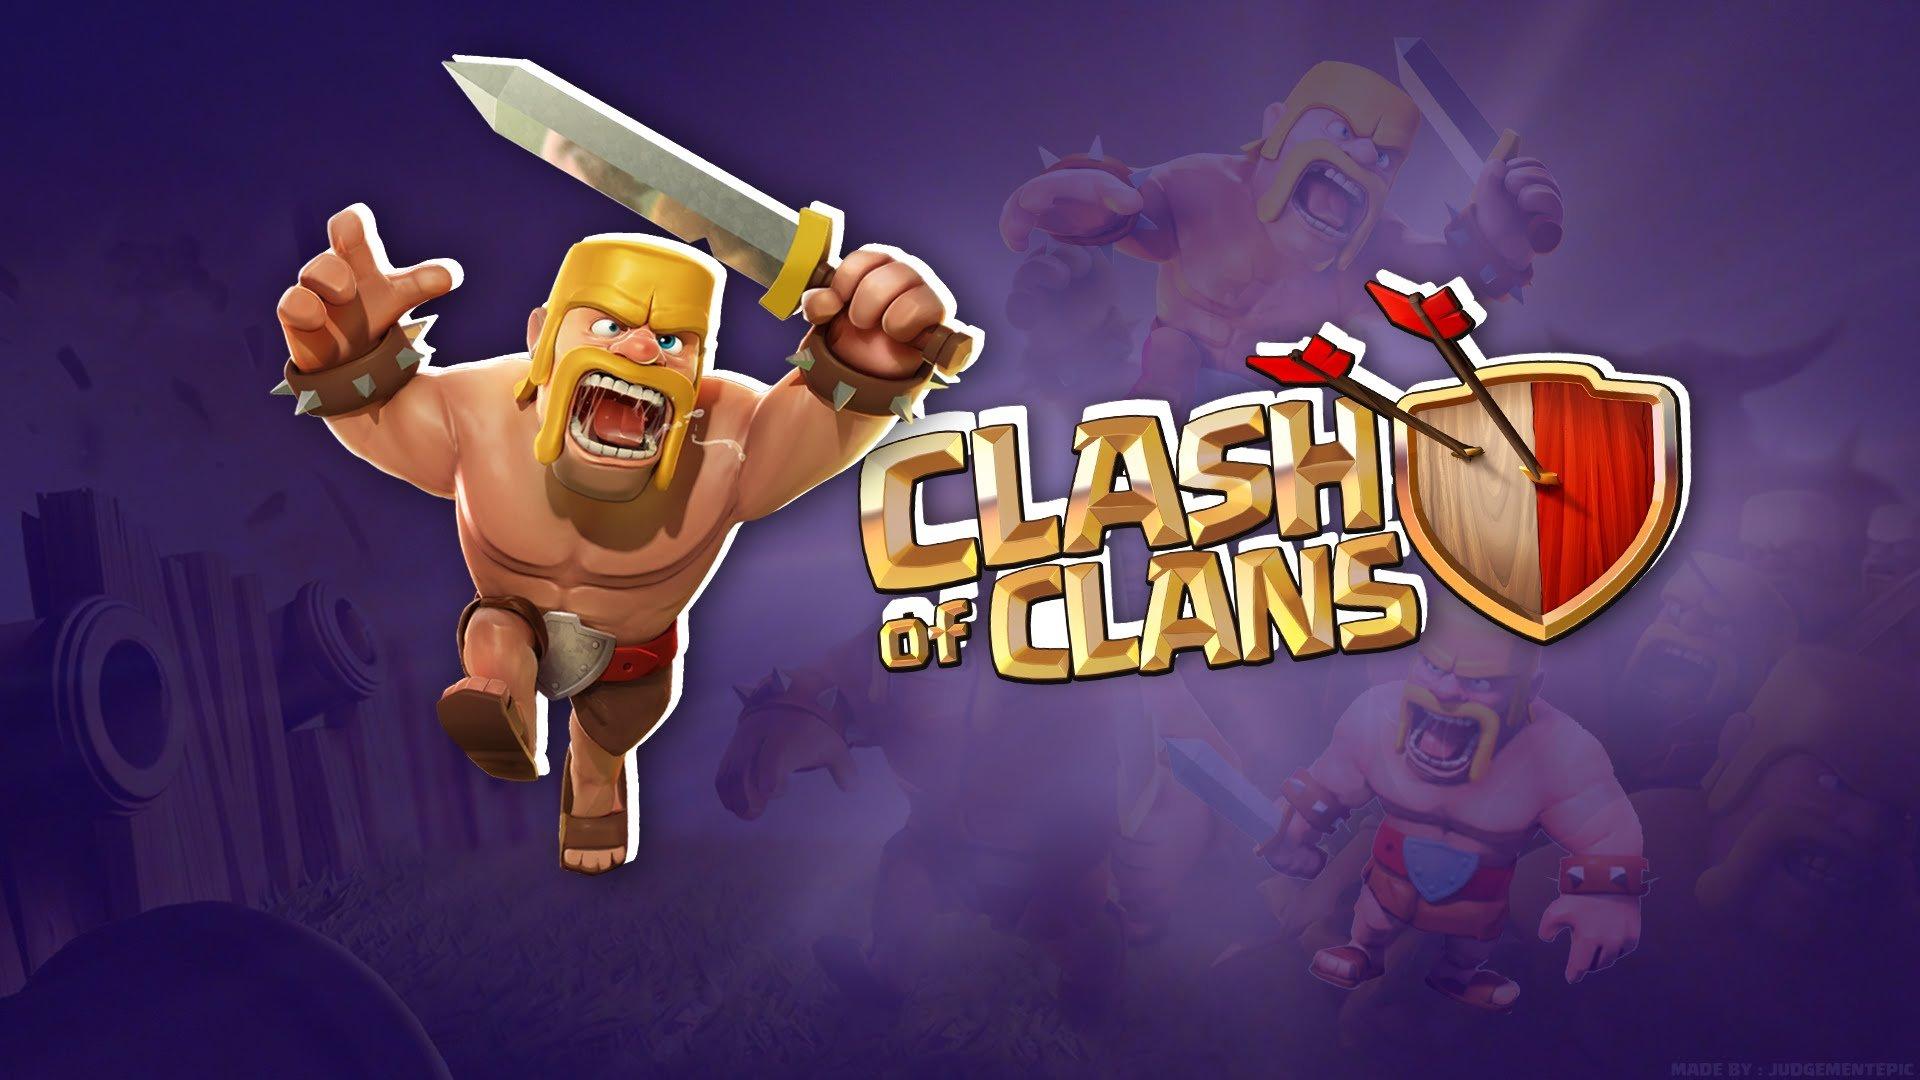 Clash Of Clans Wallpapers WeNeedFun 1920x1080